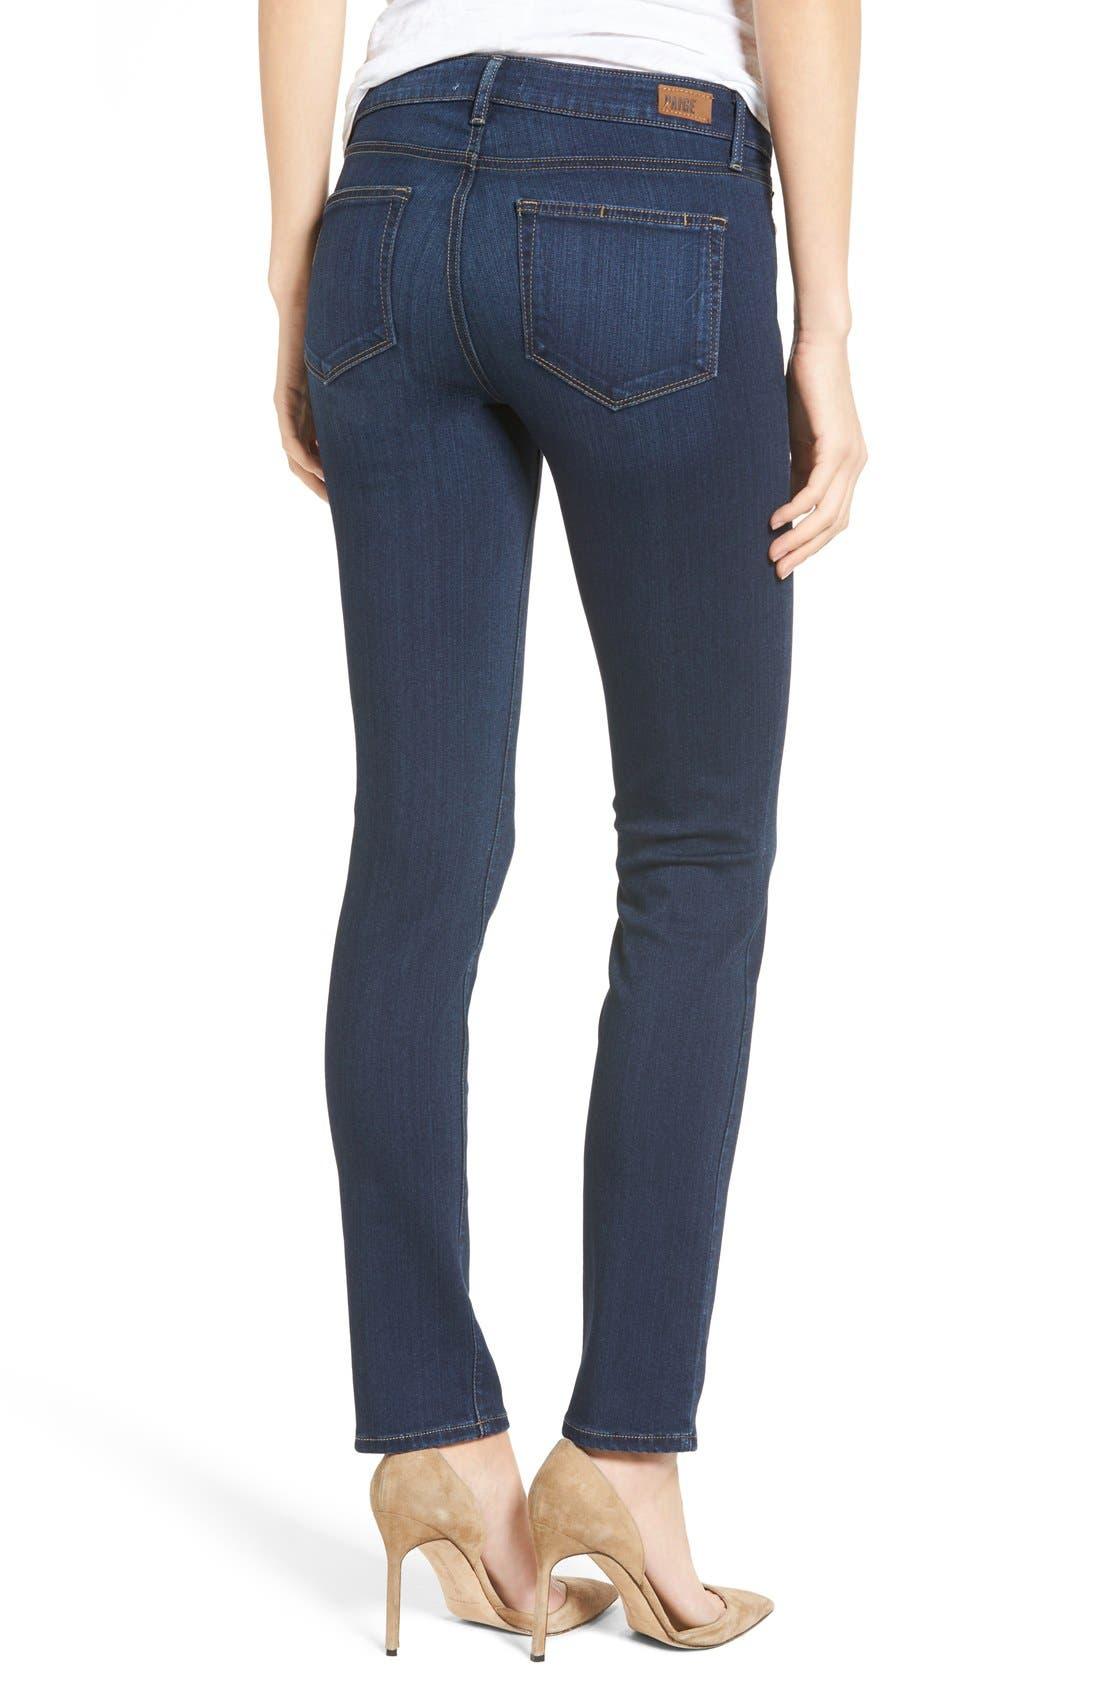 Transcend Skyline Skinny Jeans,                             Alternate thumbnail 4, color,                             400